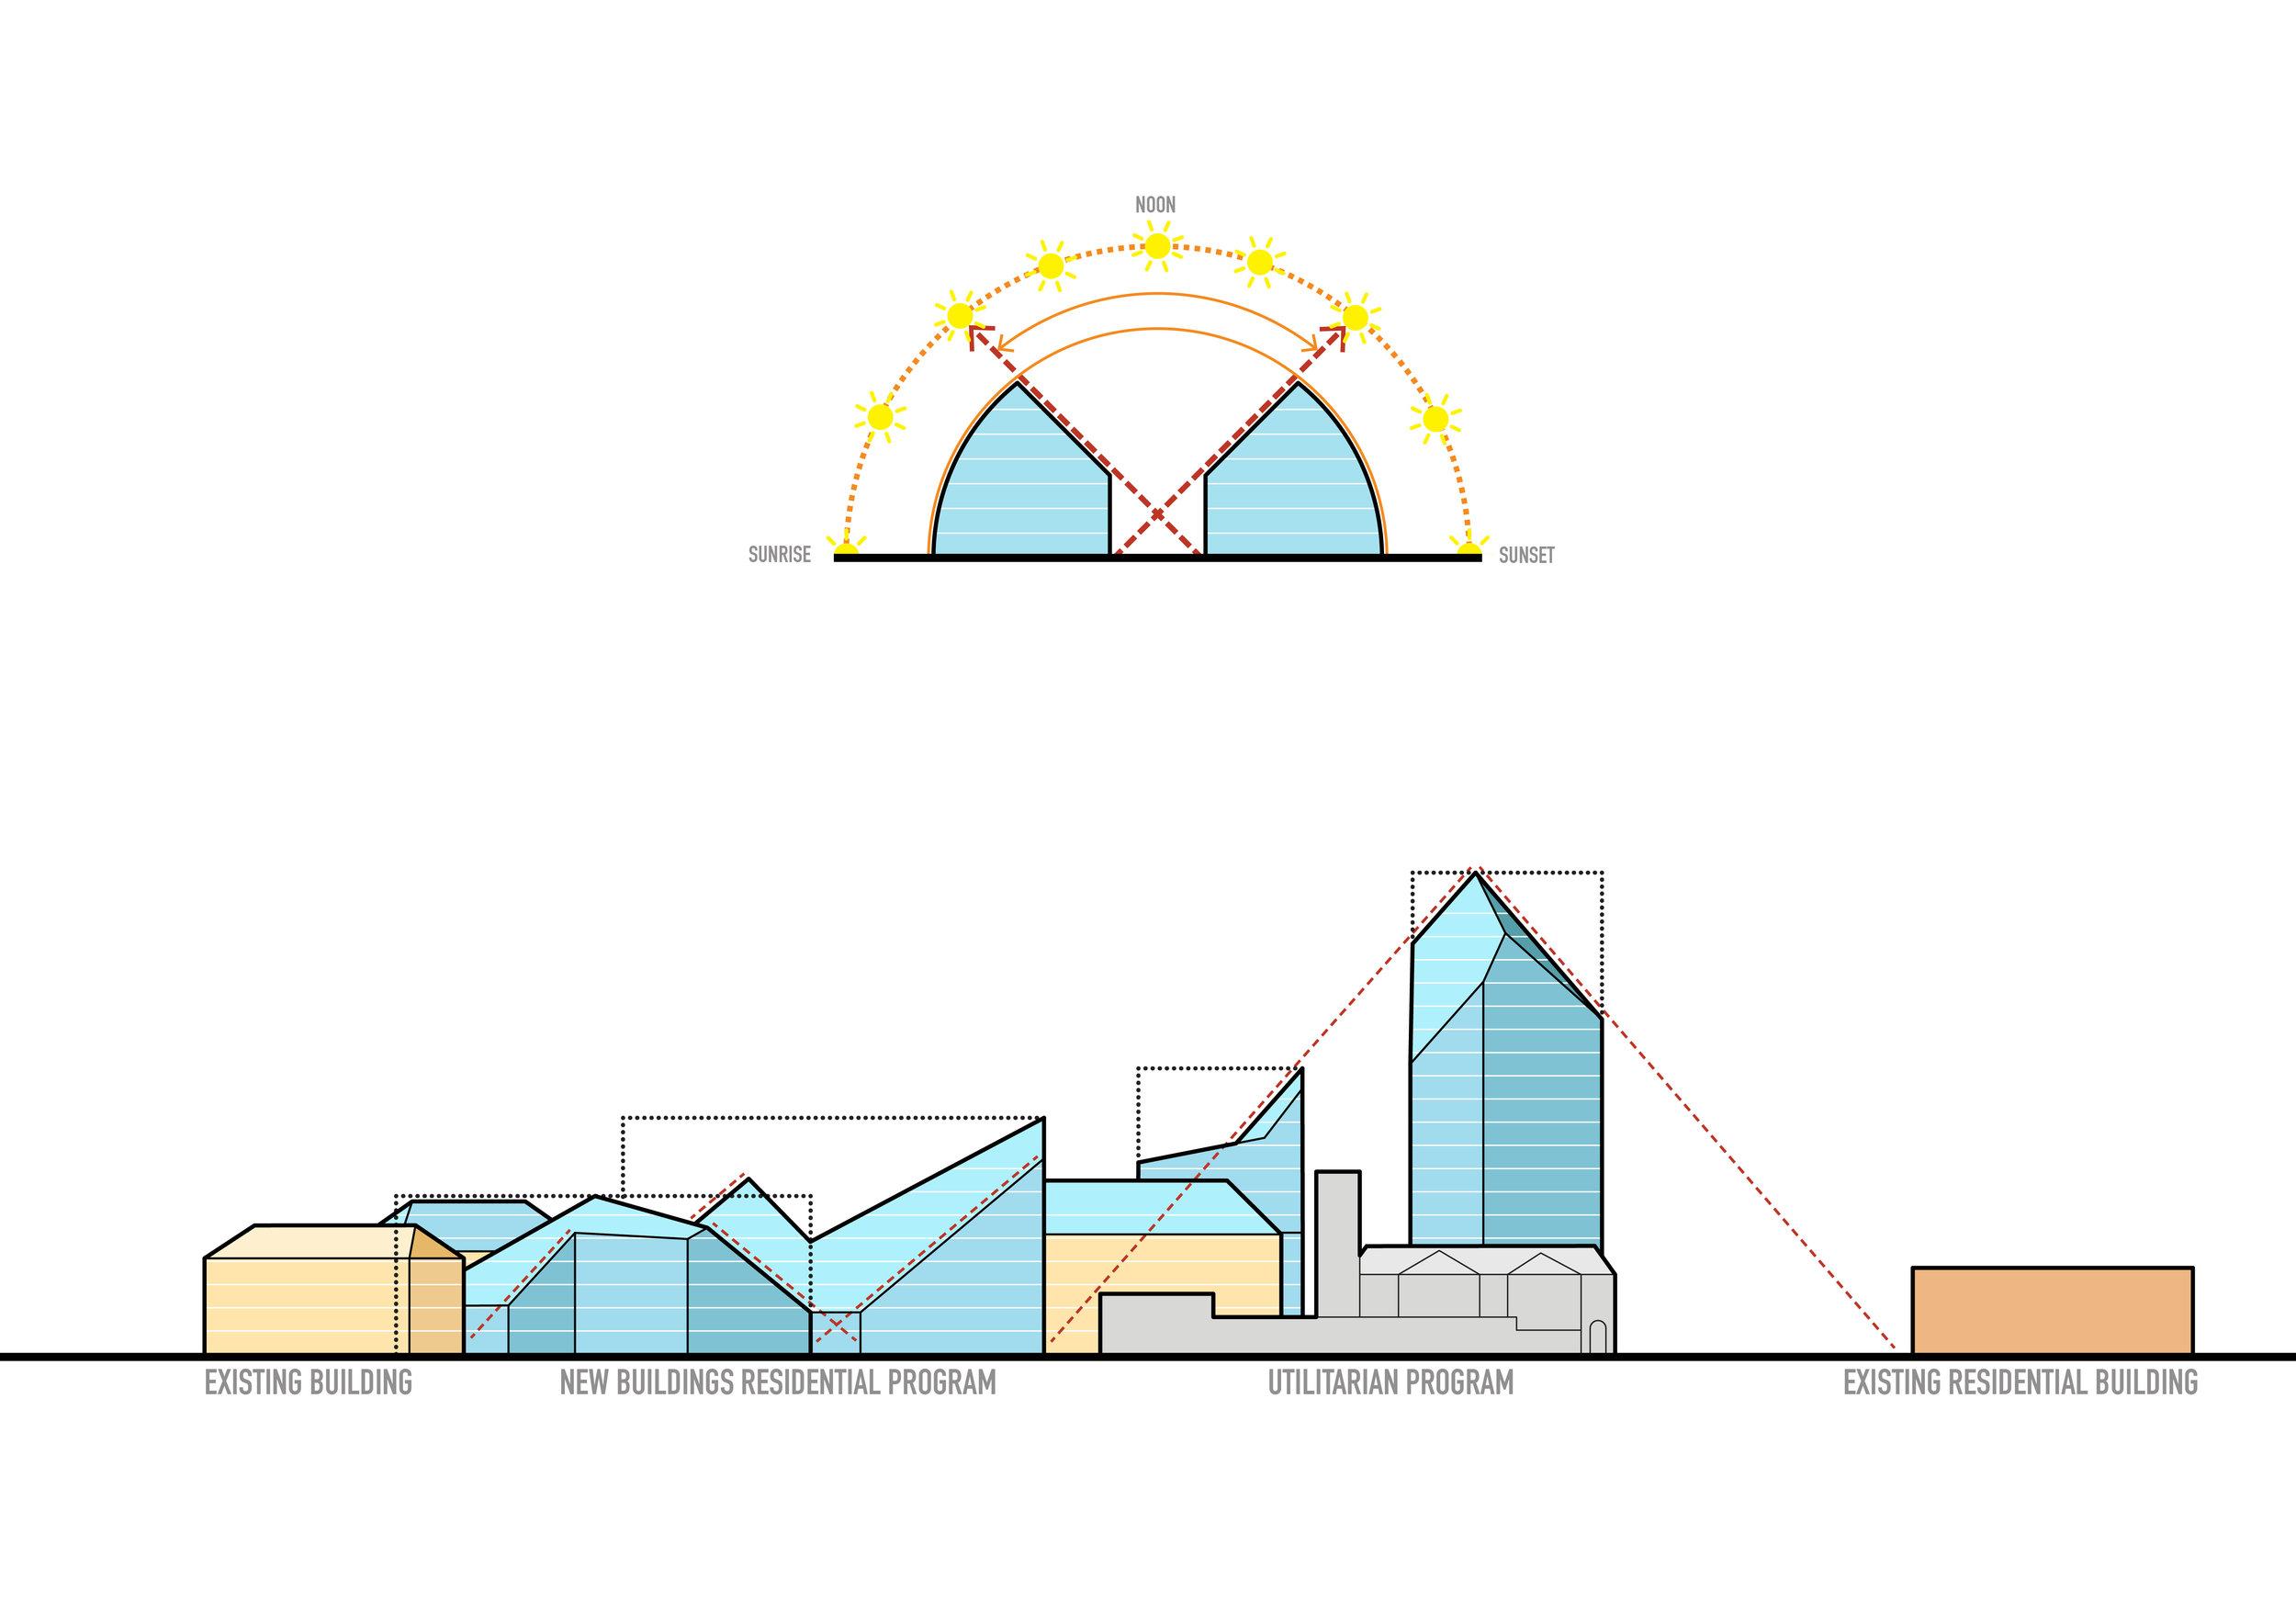 MVRDV_Nieuw Bergen_cuts concept 02_copywright MVRDV.jpg